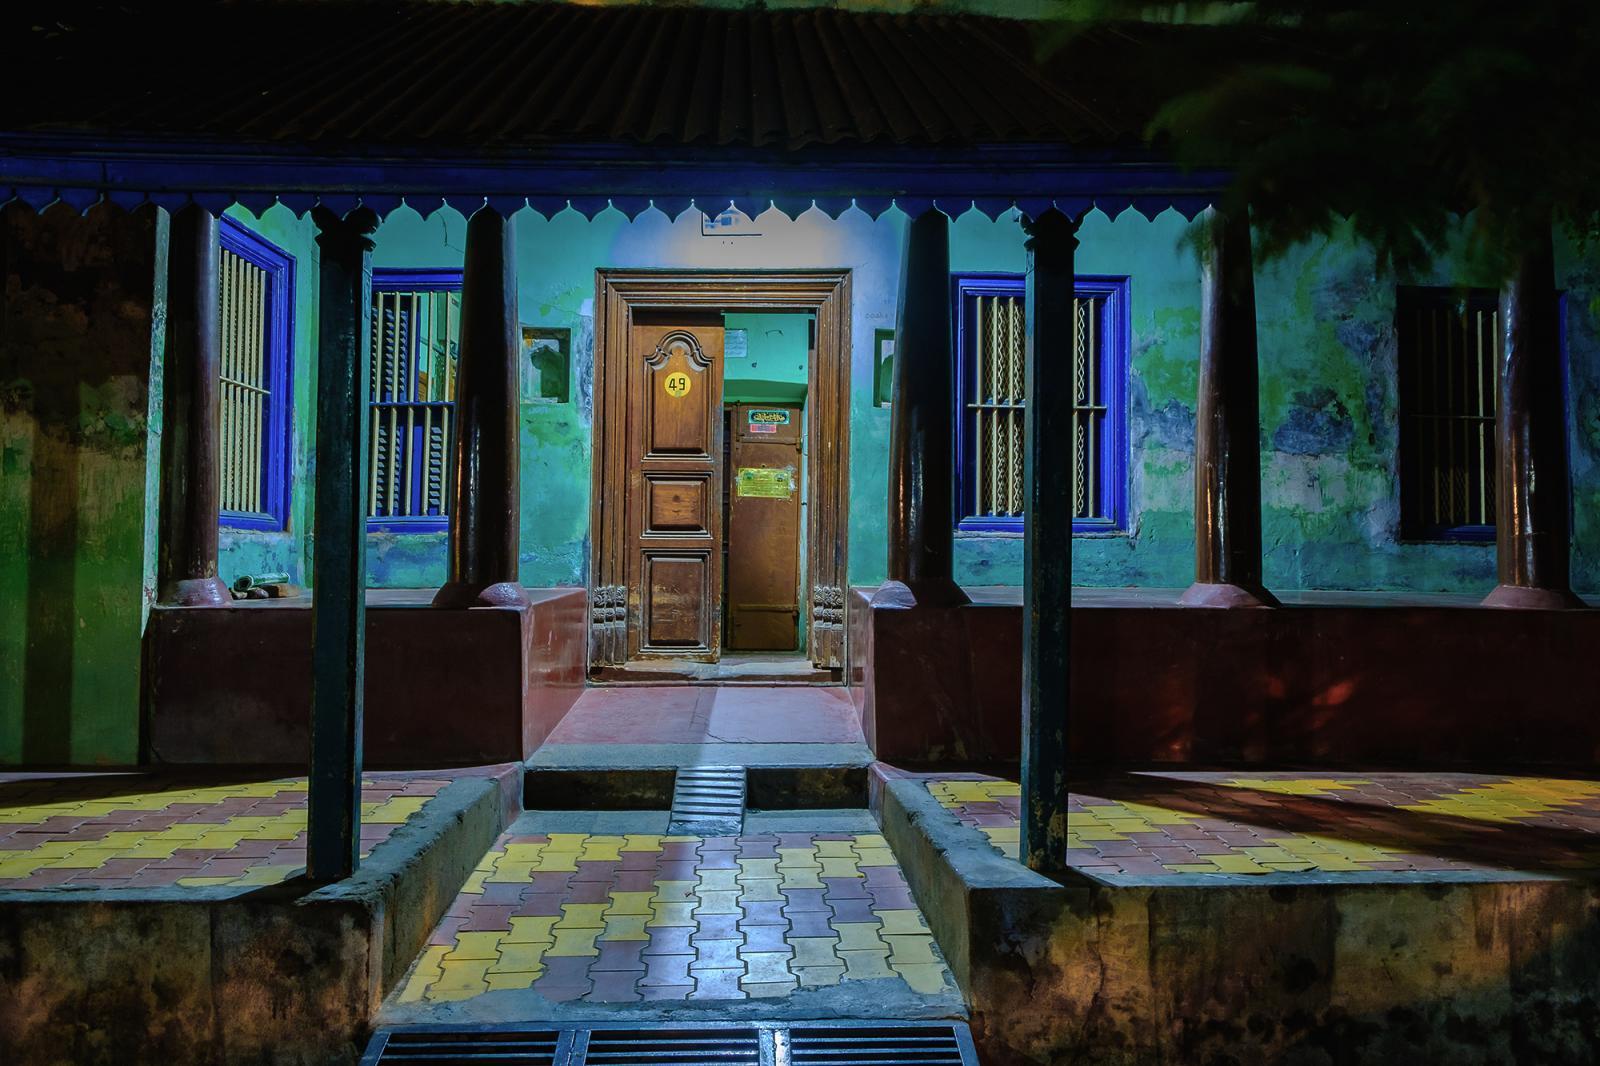 Photography image - Loading Tamil_Architecural_works__Thinnai_pondicherry__culture_tamil__Tamilnadu__Tamils_home._Vintage_design___mouhamed_moustapha__colours__thinnai14.jpg